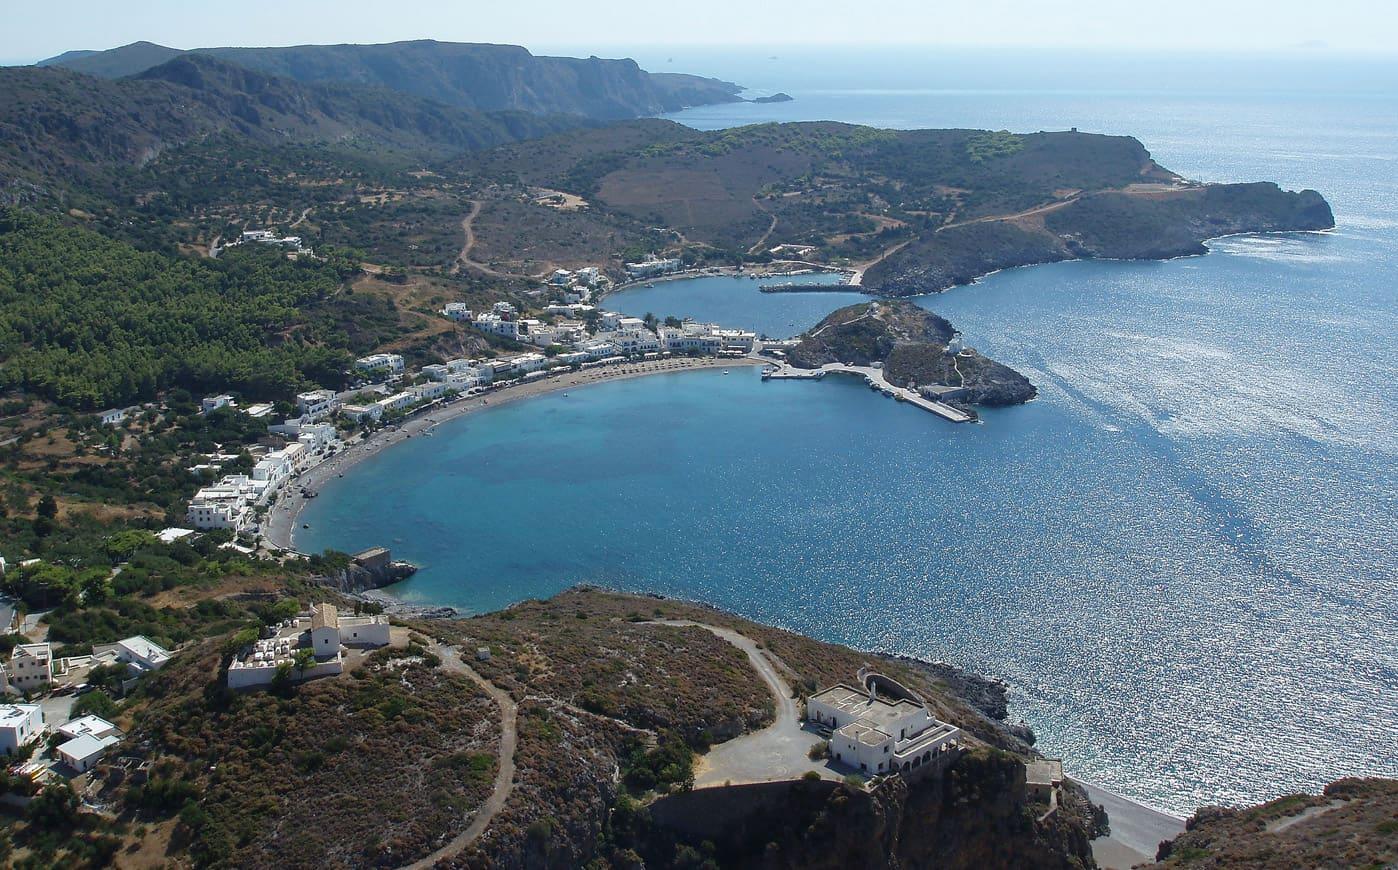 Aegean Sailing Tours